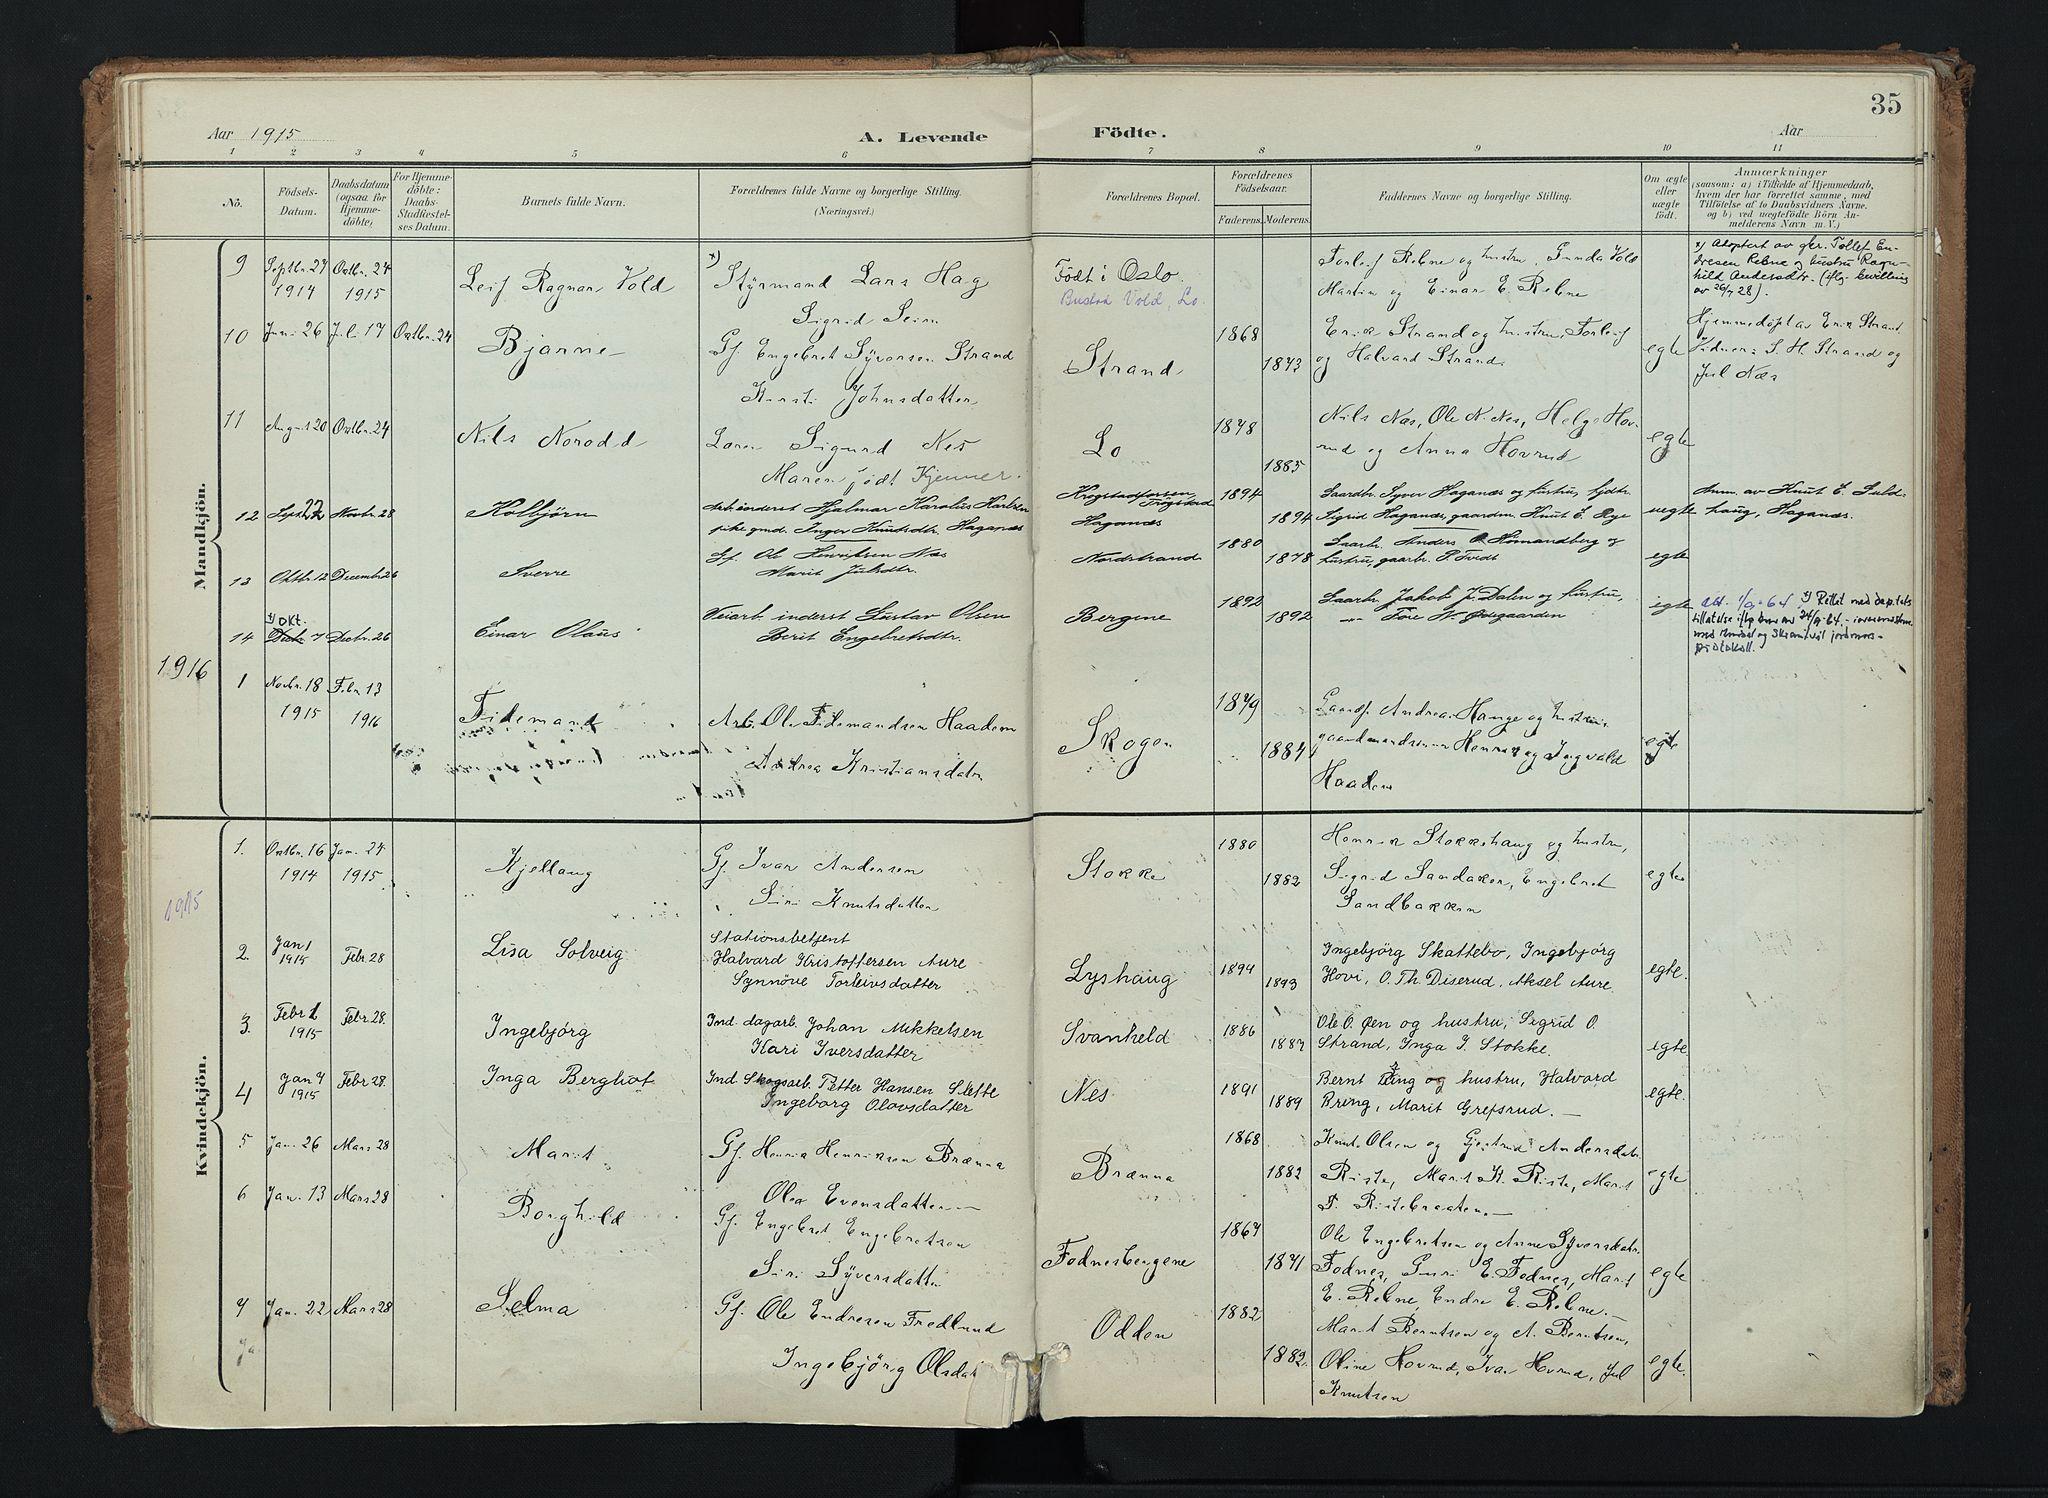 SAH, Nord-Aurdal prestekontor, Ministerialbok nr. 16, 1897-1925, s. 35